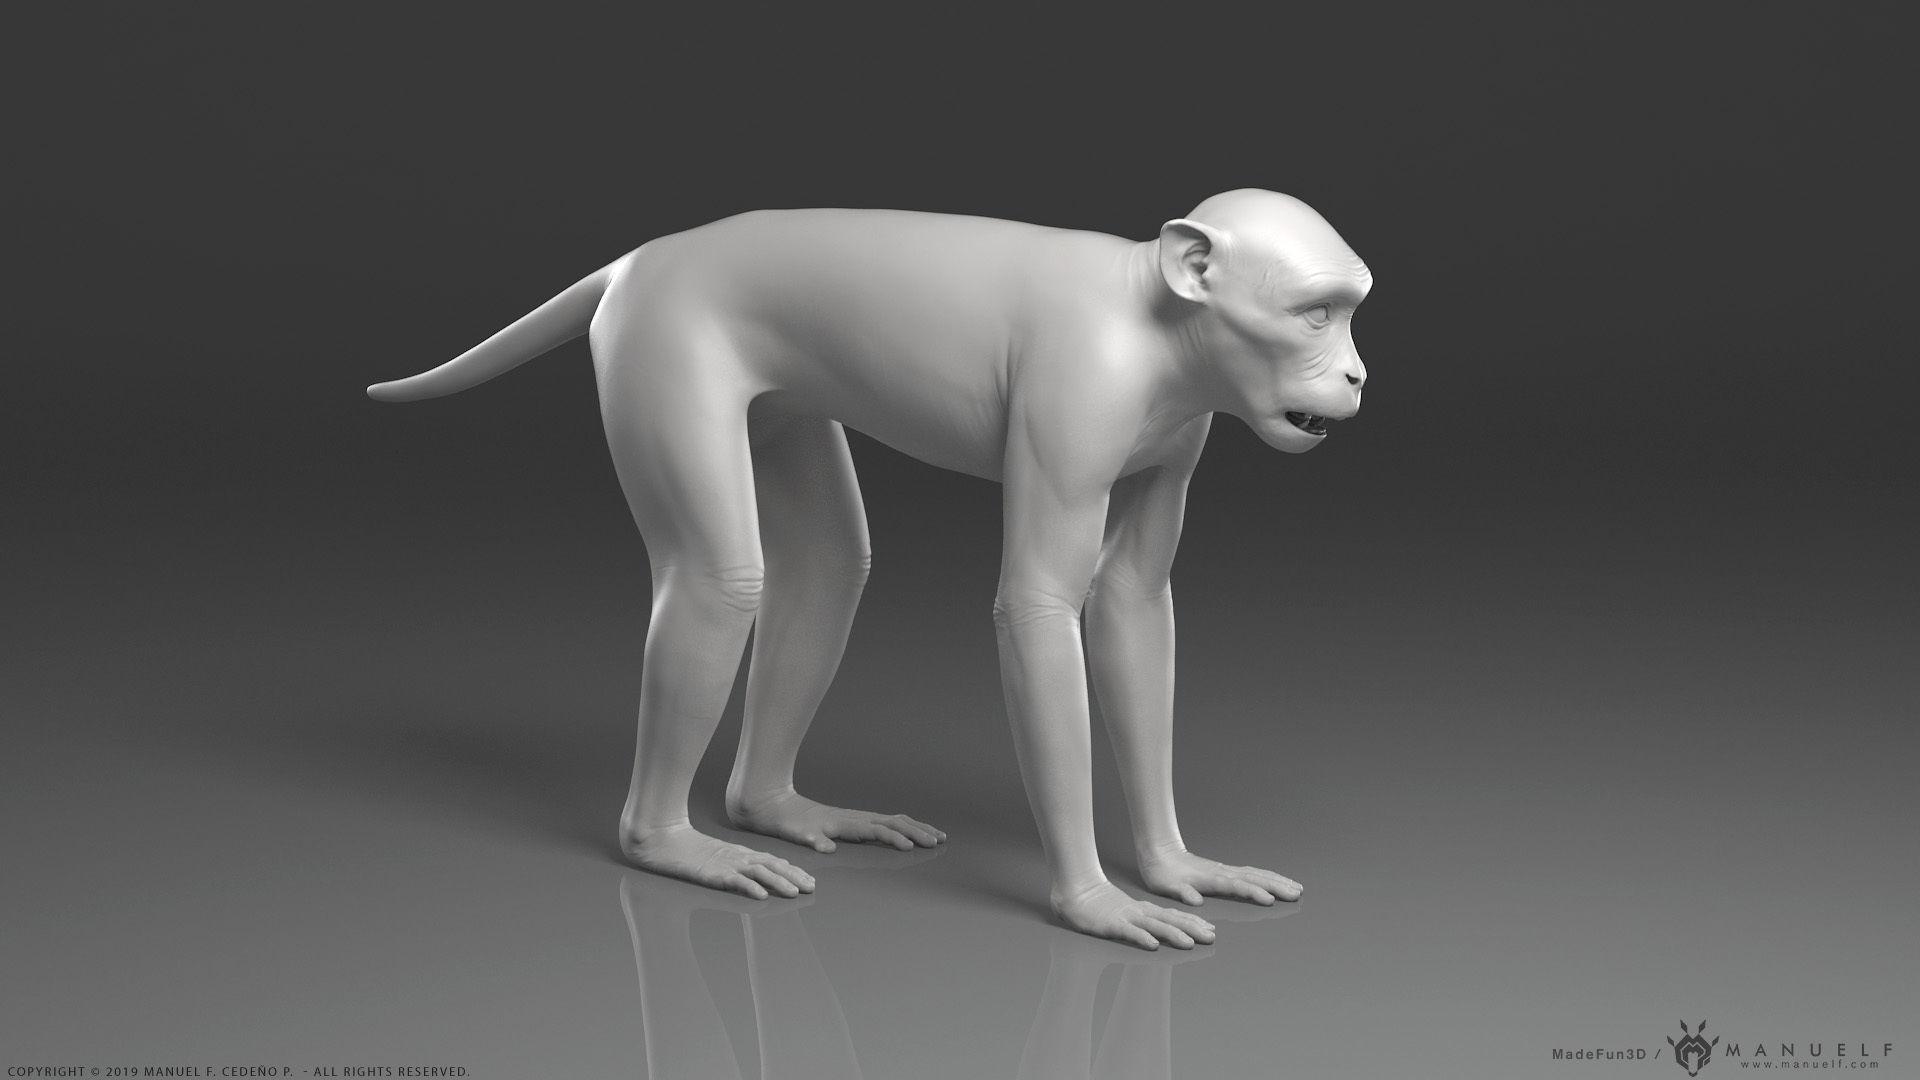 Rhesus Macaque Monkey - Highpoly Sculpture